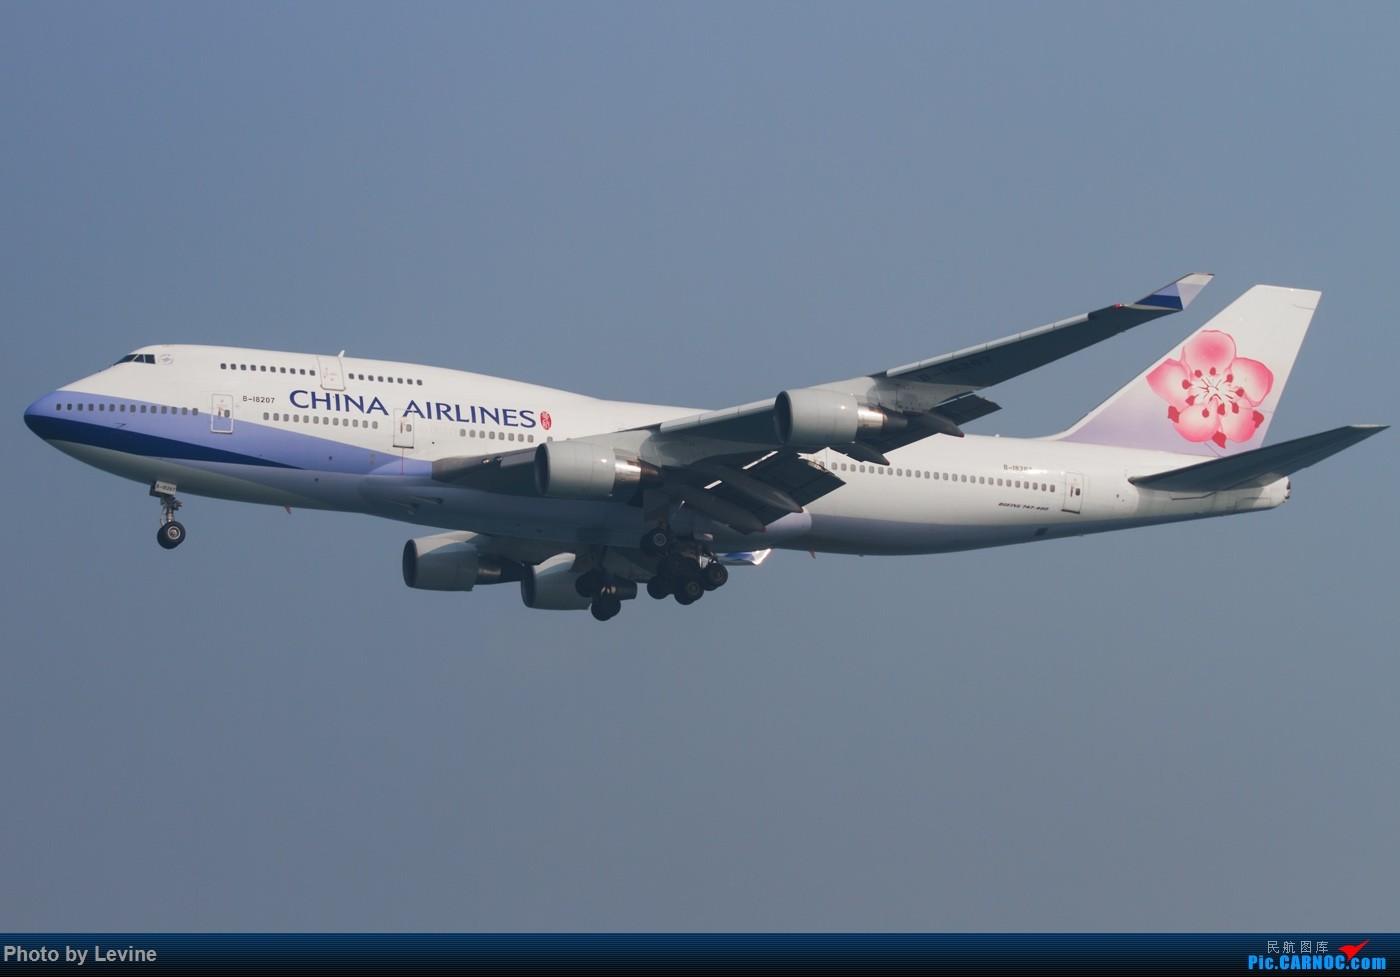 Re:[原创]◇ ■ ◇ ■ ◇ ■难得去一次香港却遇到大烂天◇ ■ ◇ ■ ◇ ■ BOEING 747-400 B-18207 中国香港赤鱲角国际机场